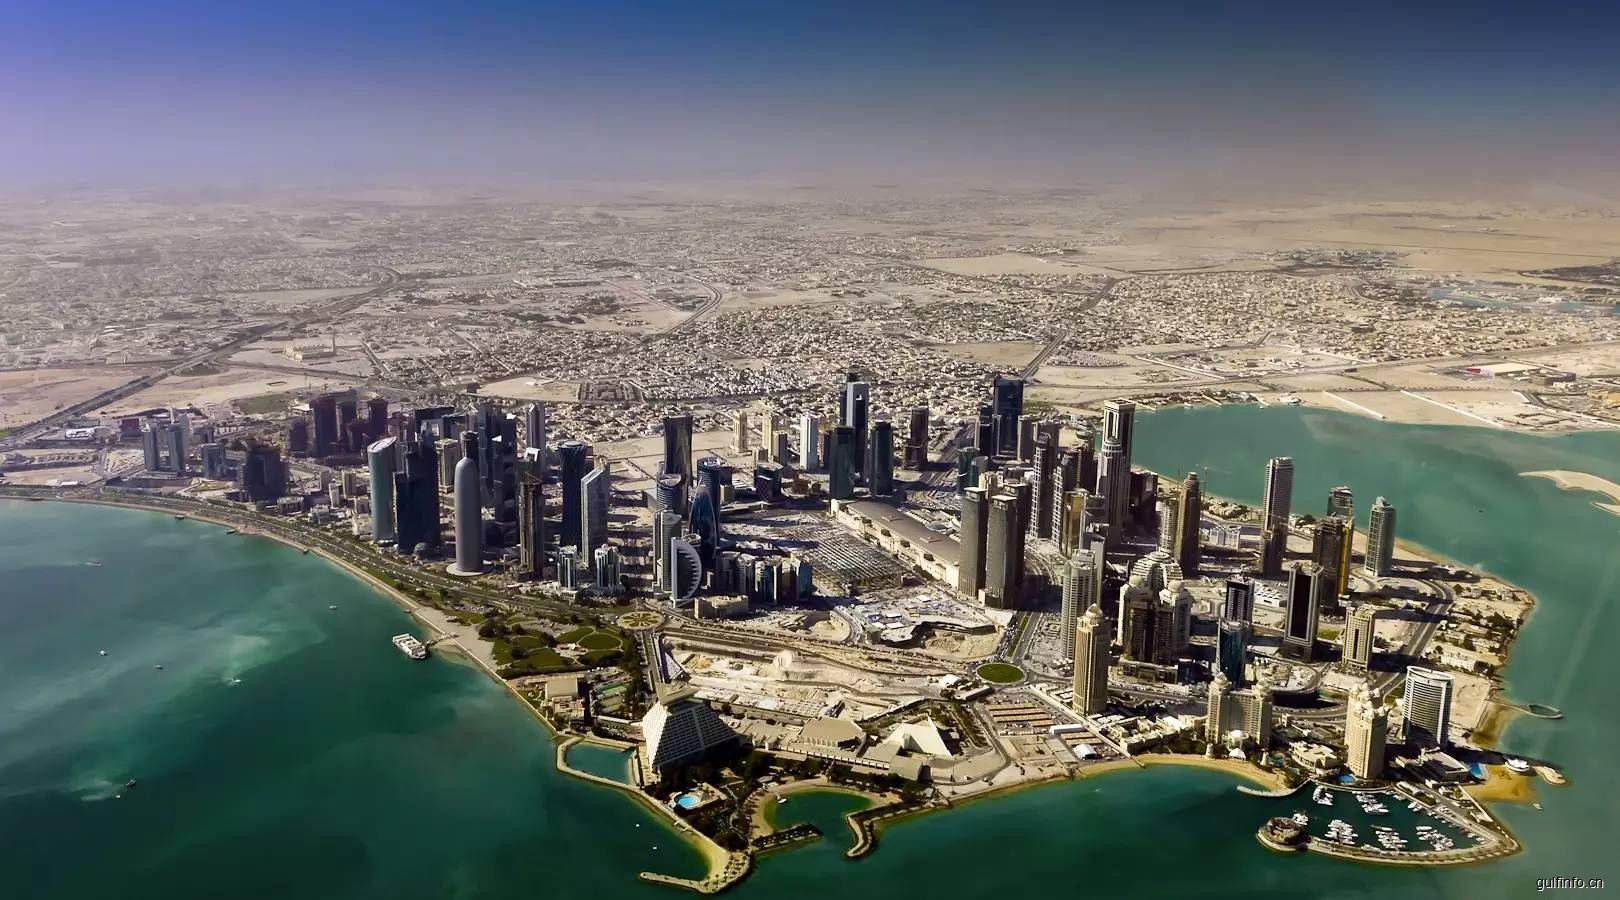 中东北非各国期待<font color=#ff0000>旅</font><font color=#ff0000>游</font>业复苏